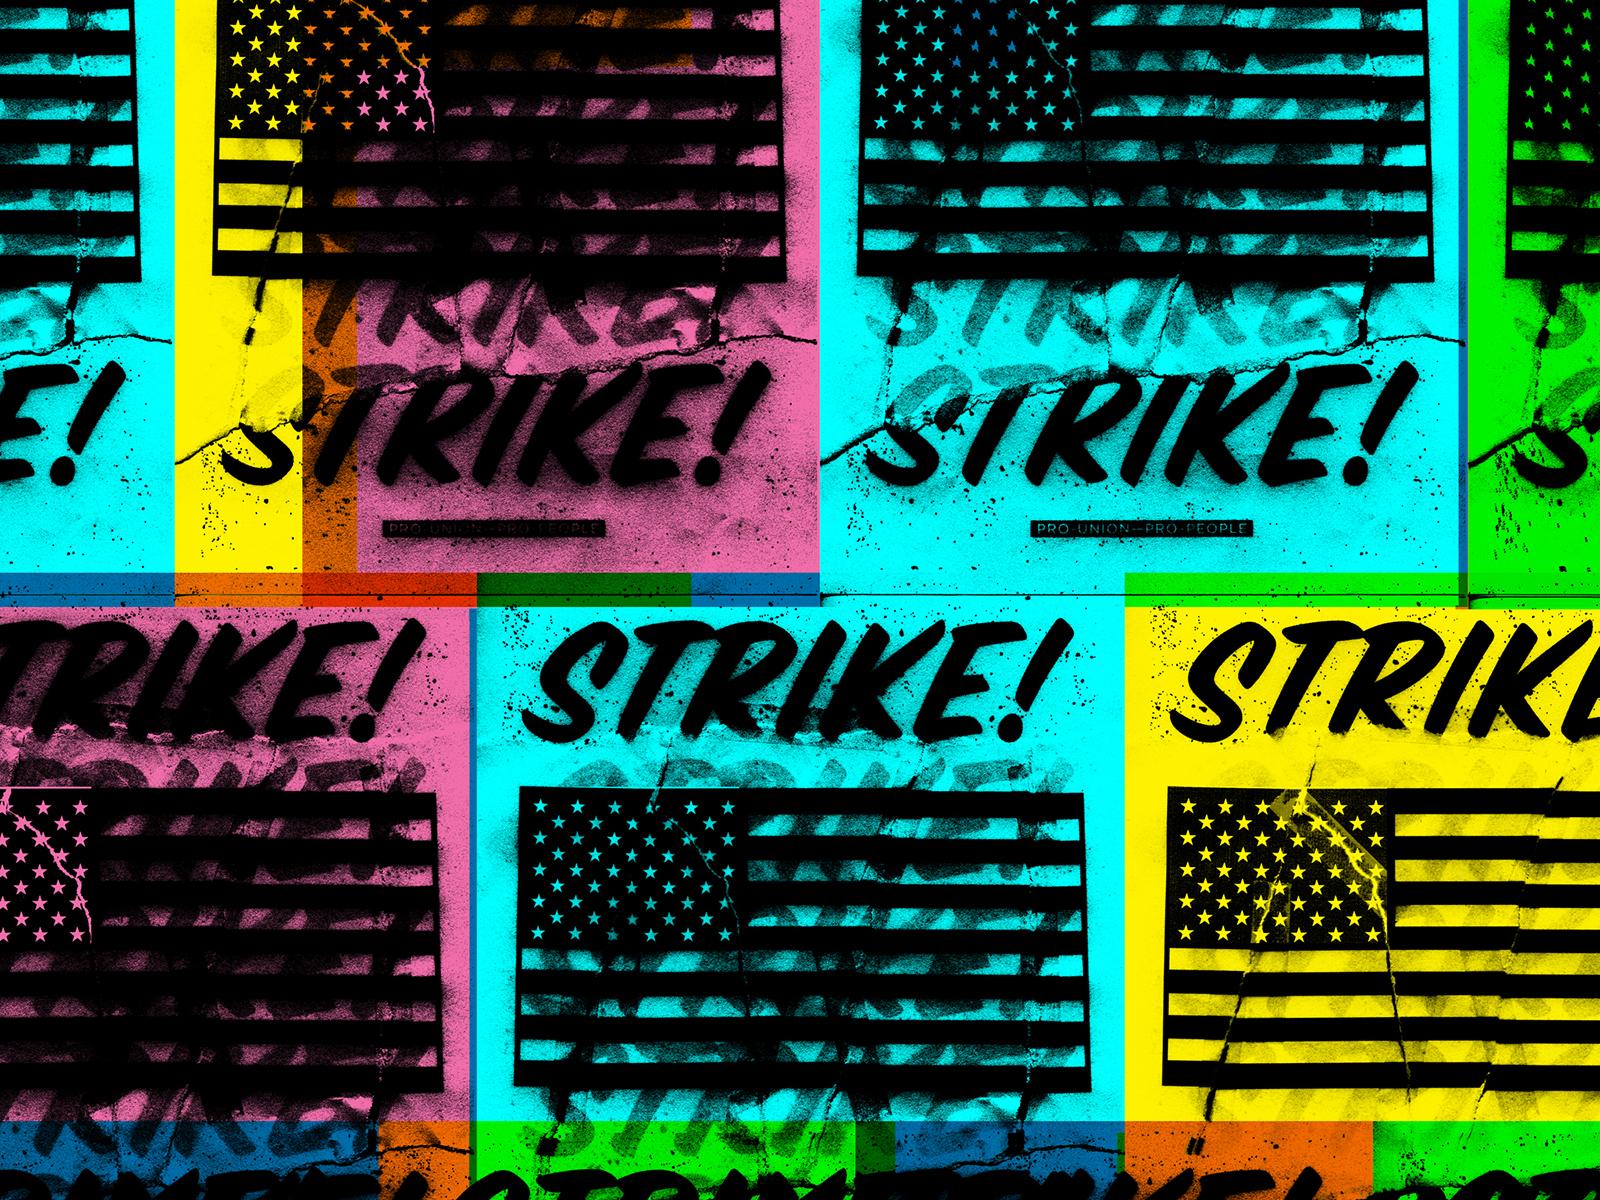 Jkdc strikestrikestrike poster